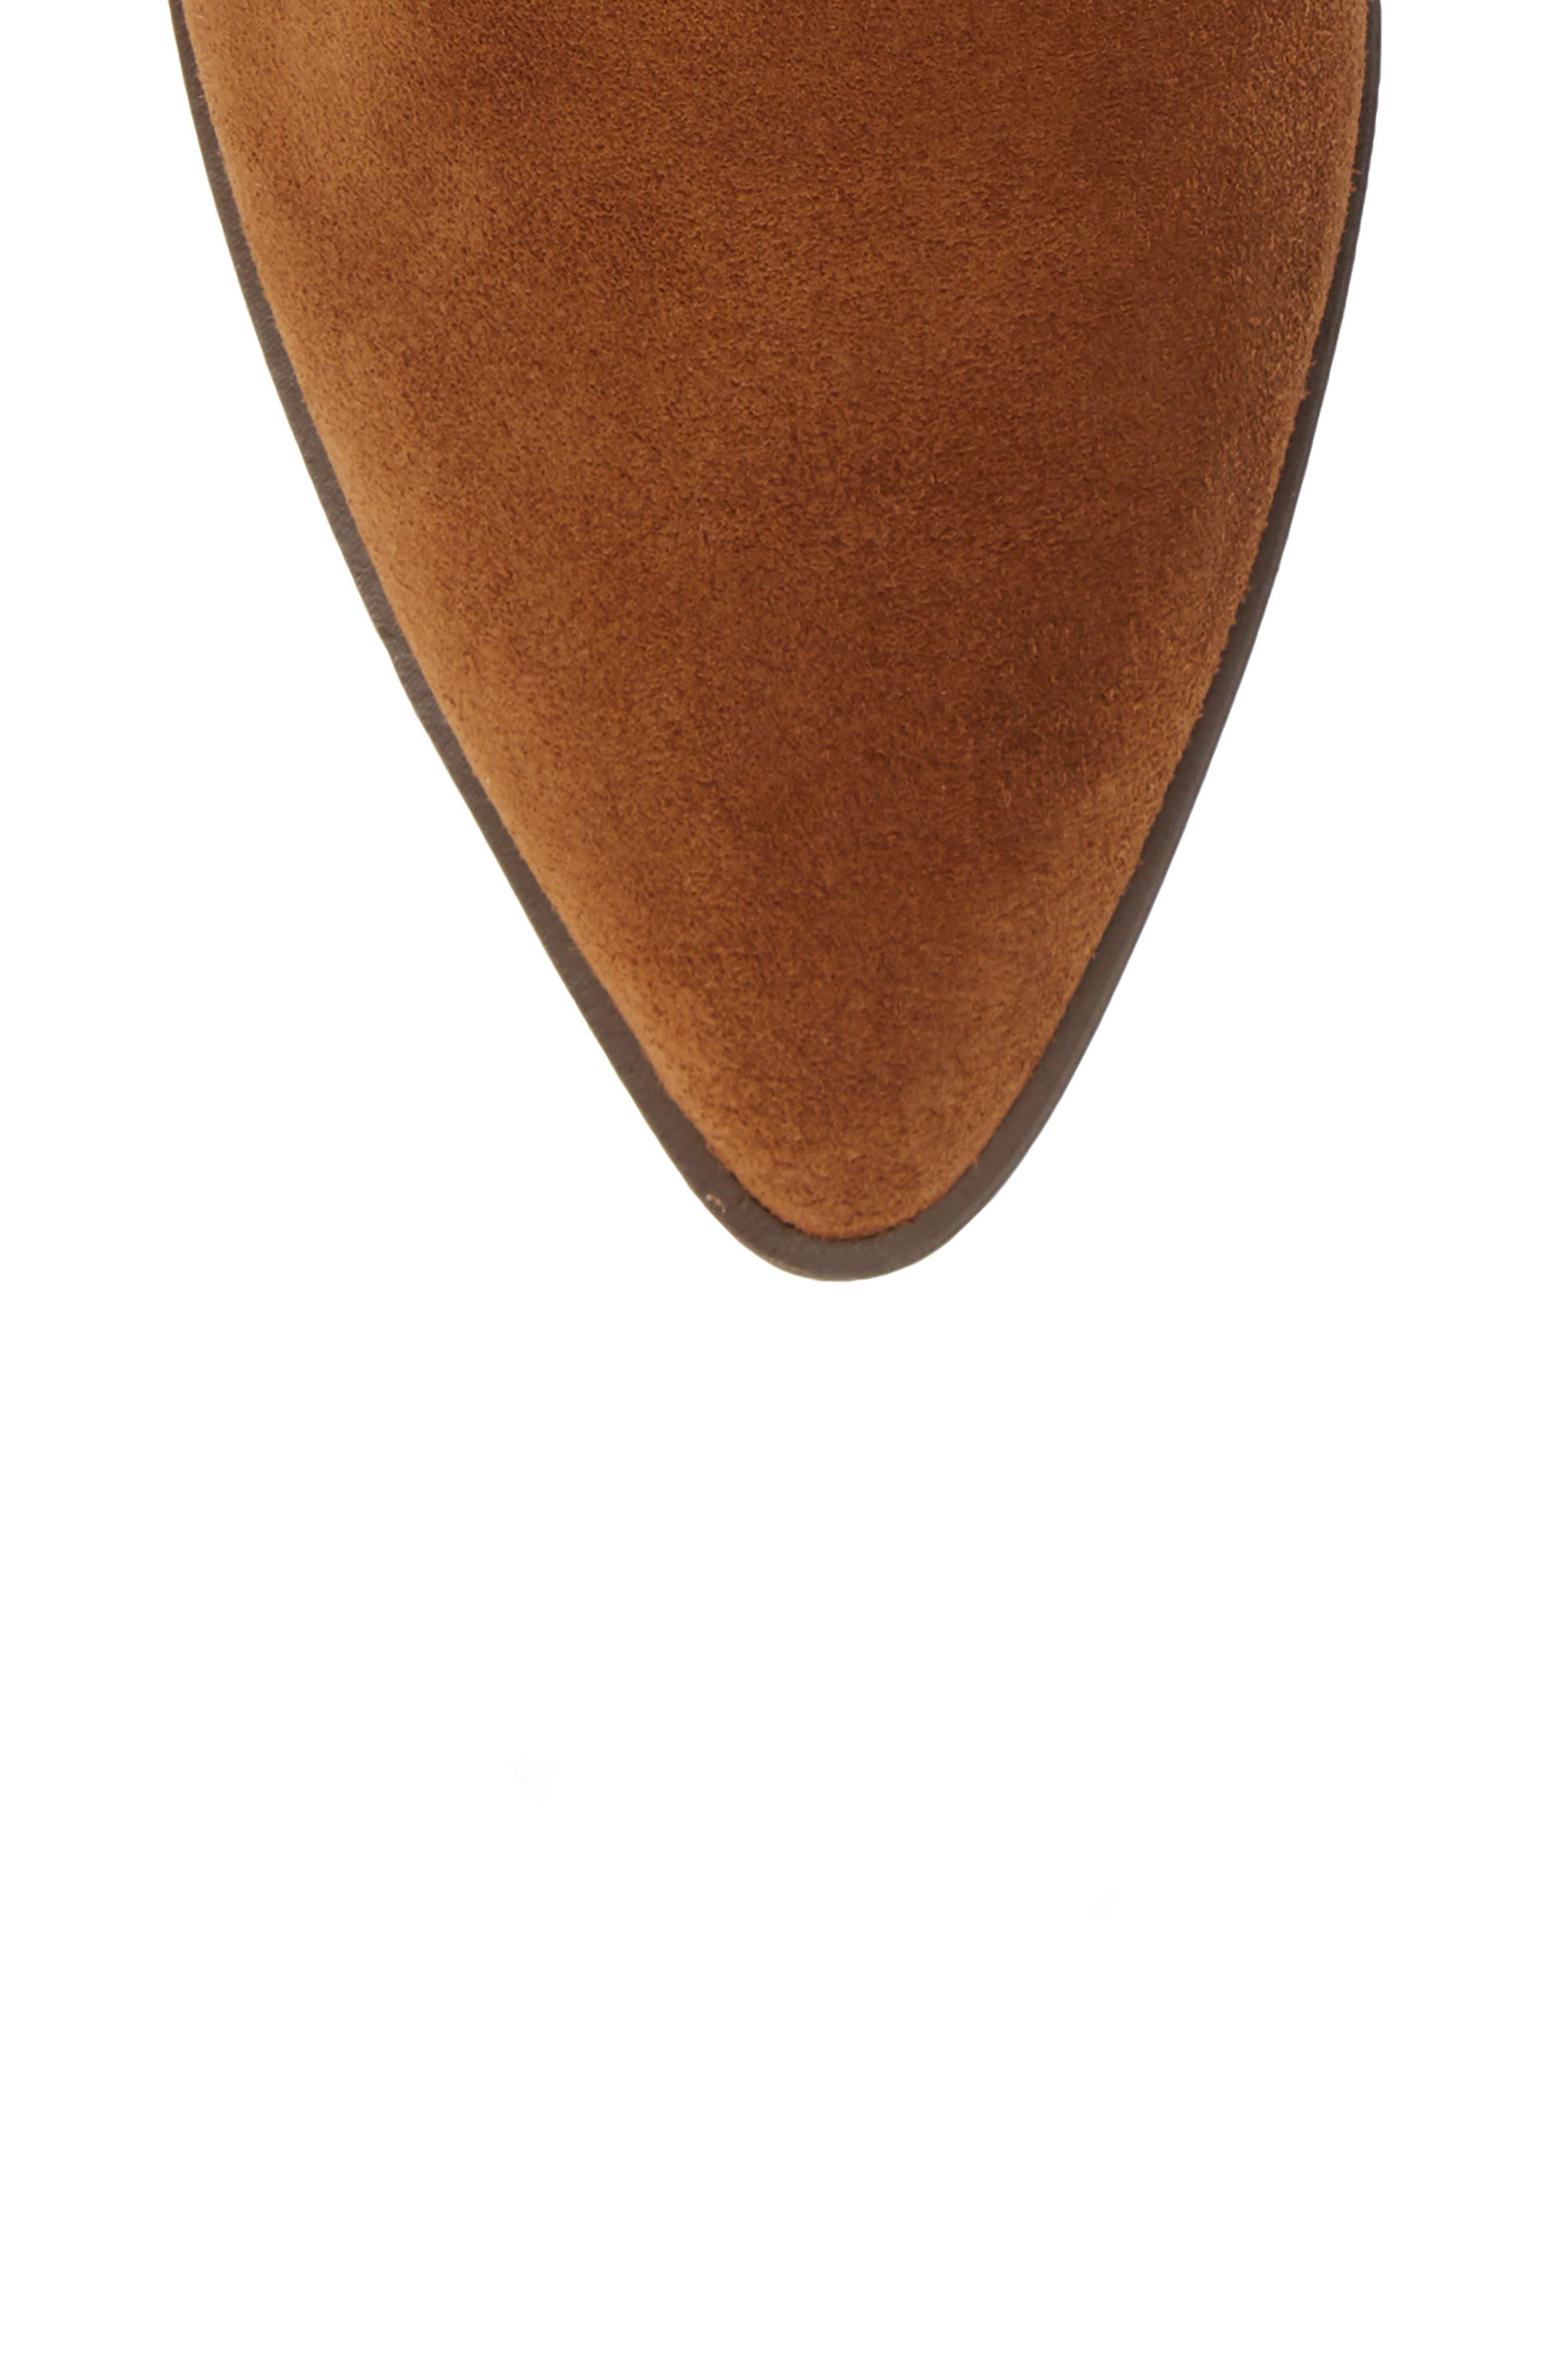 Kaiegan Bootie,                             Alternate thumbnail 5, color,                             SADDLE SUEDE